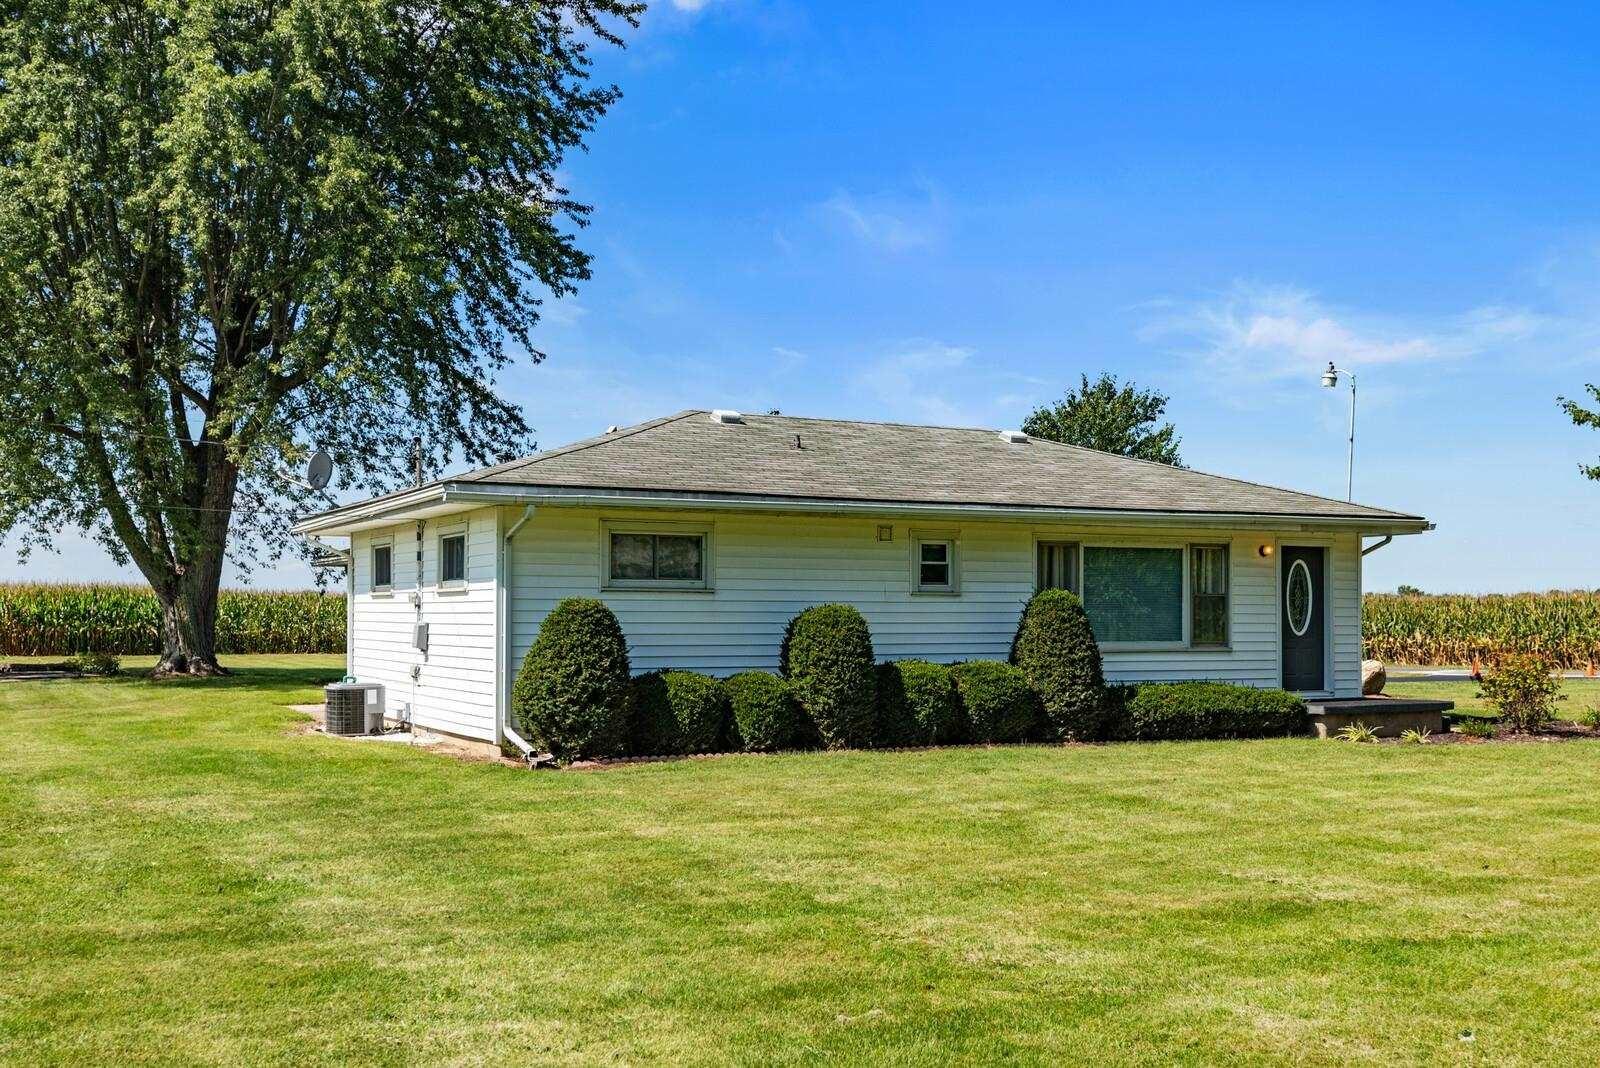 Home for Sale Jonesboro, Indiana